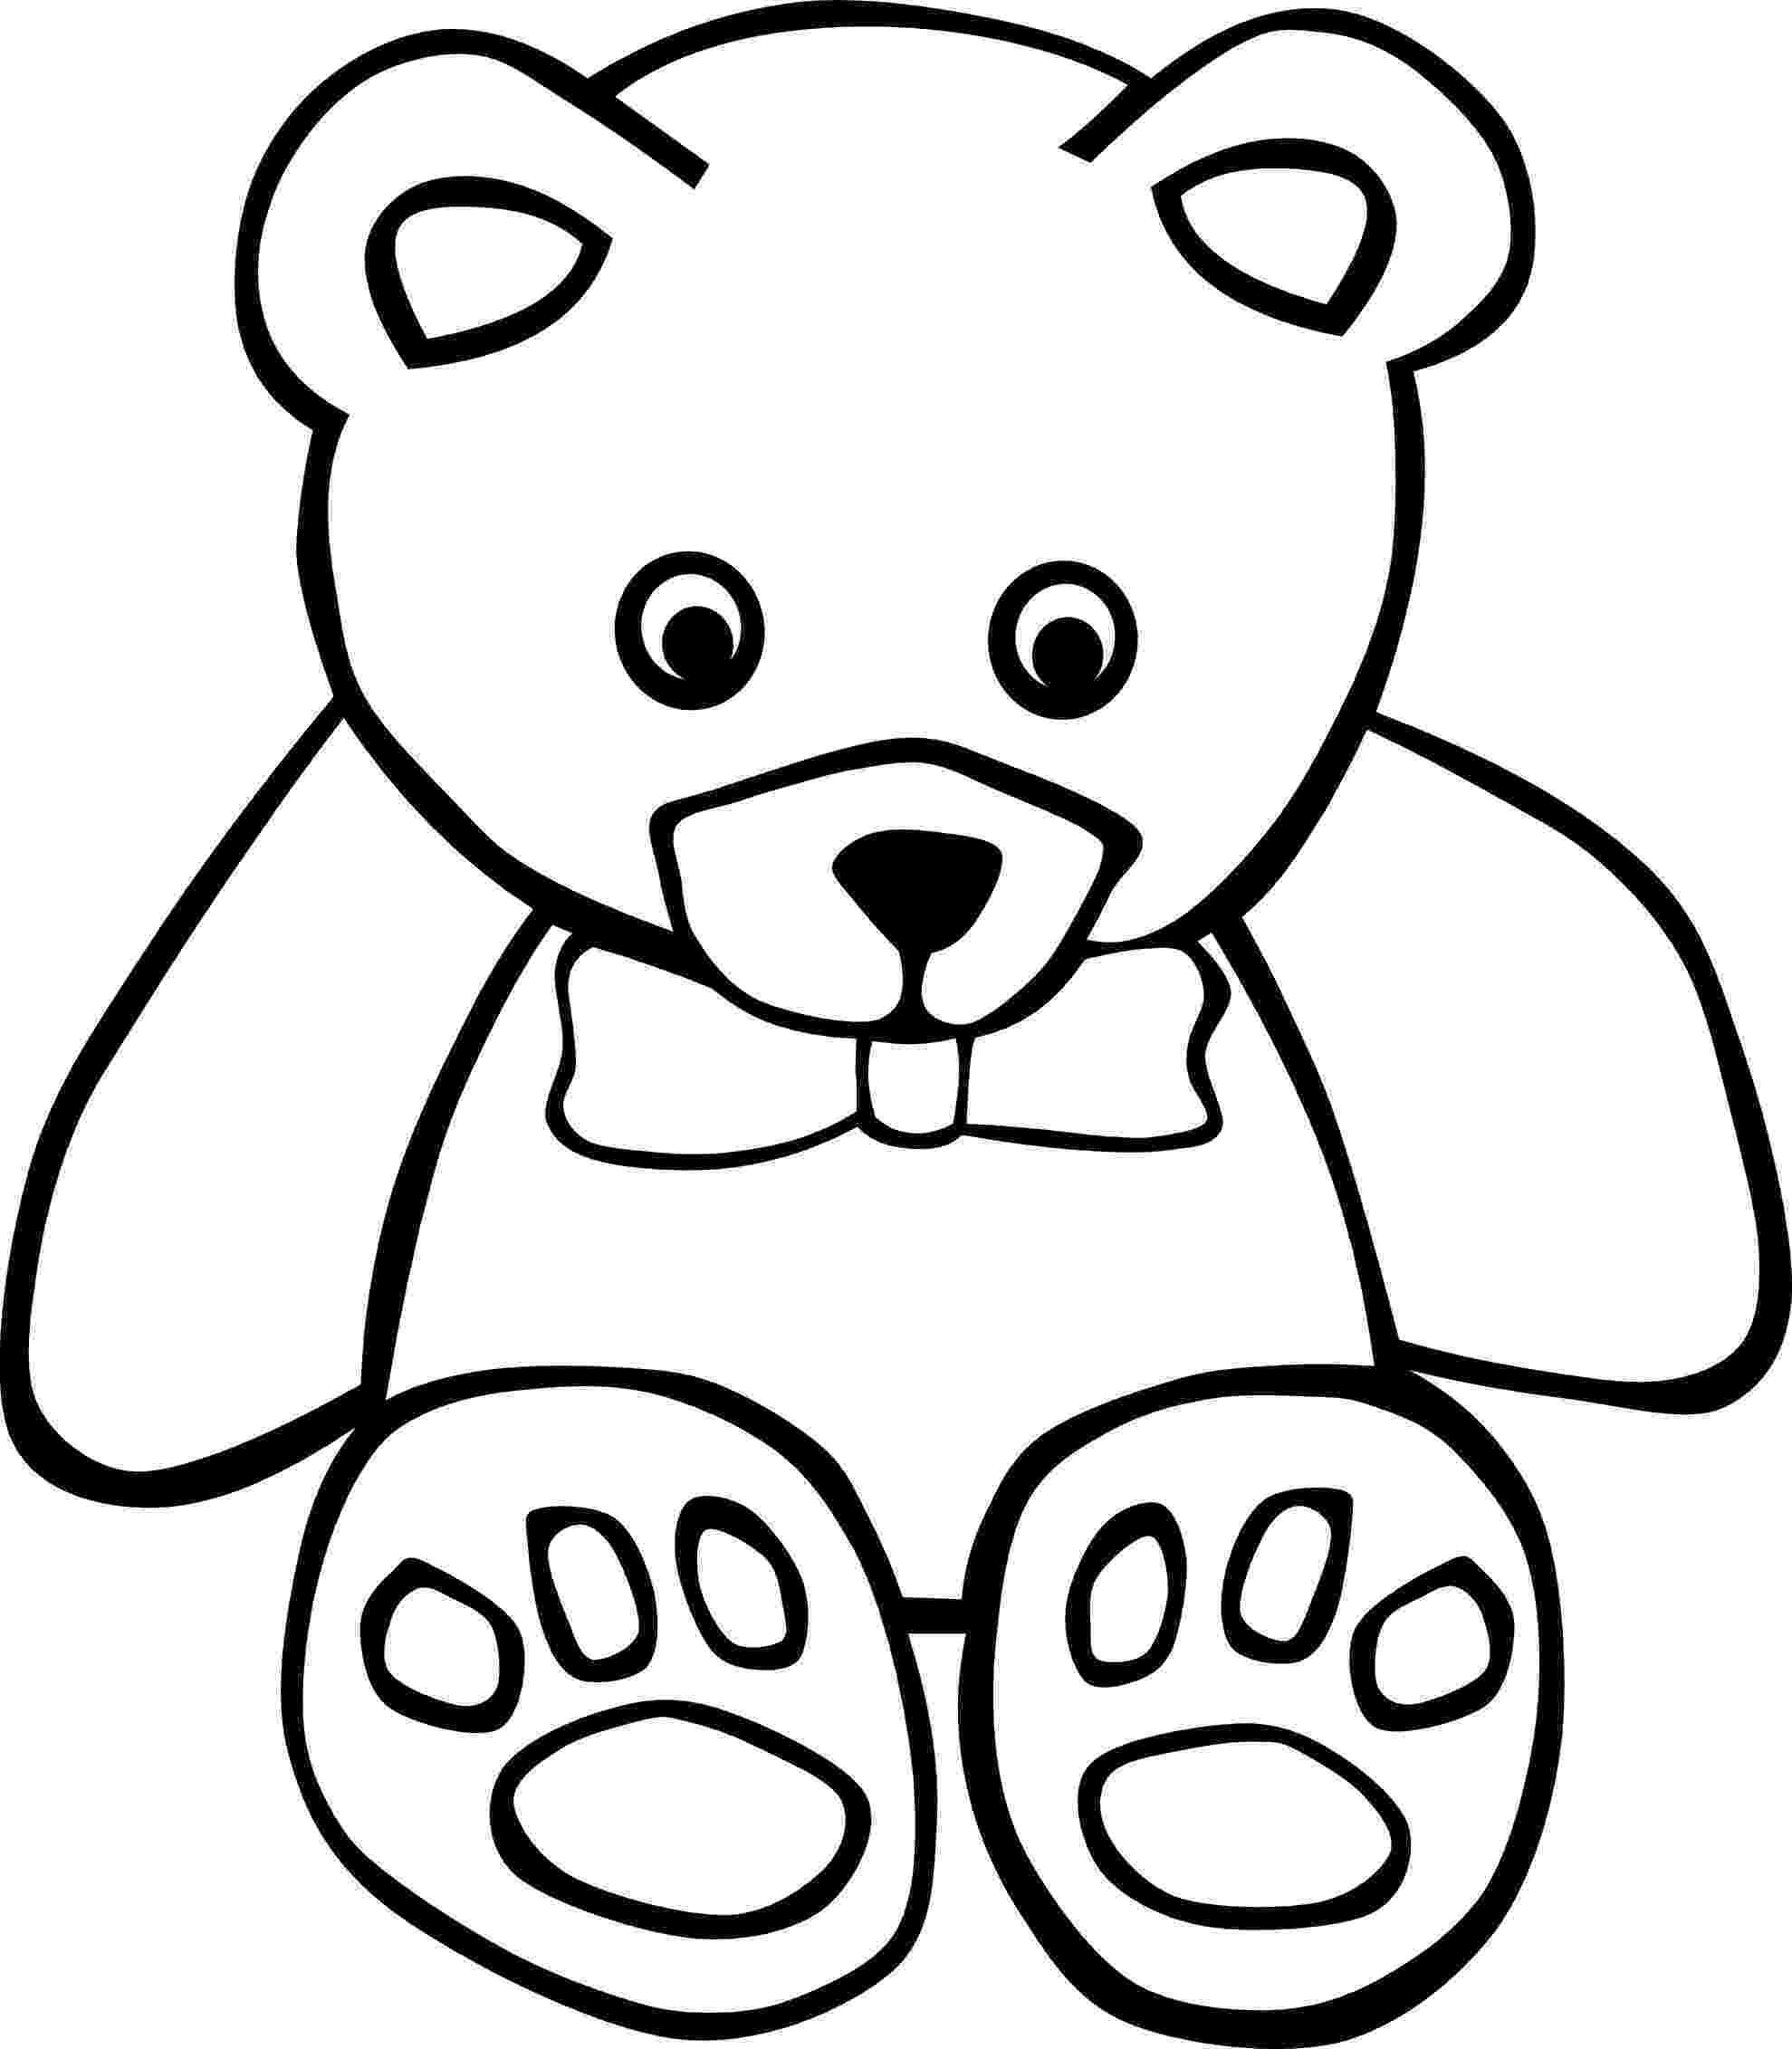 coloring sheet teddy bear teddy bear coloring pages gtgt disney coloring pages bear teddy sheet coloring